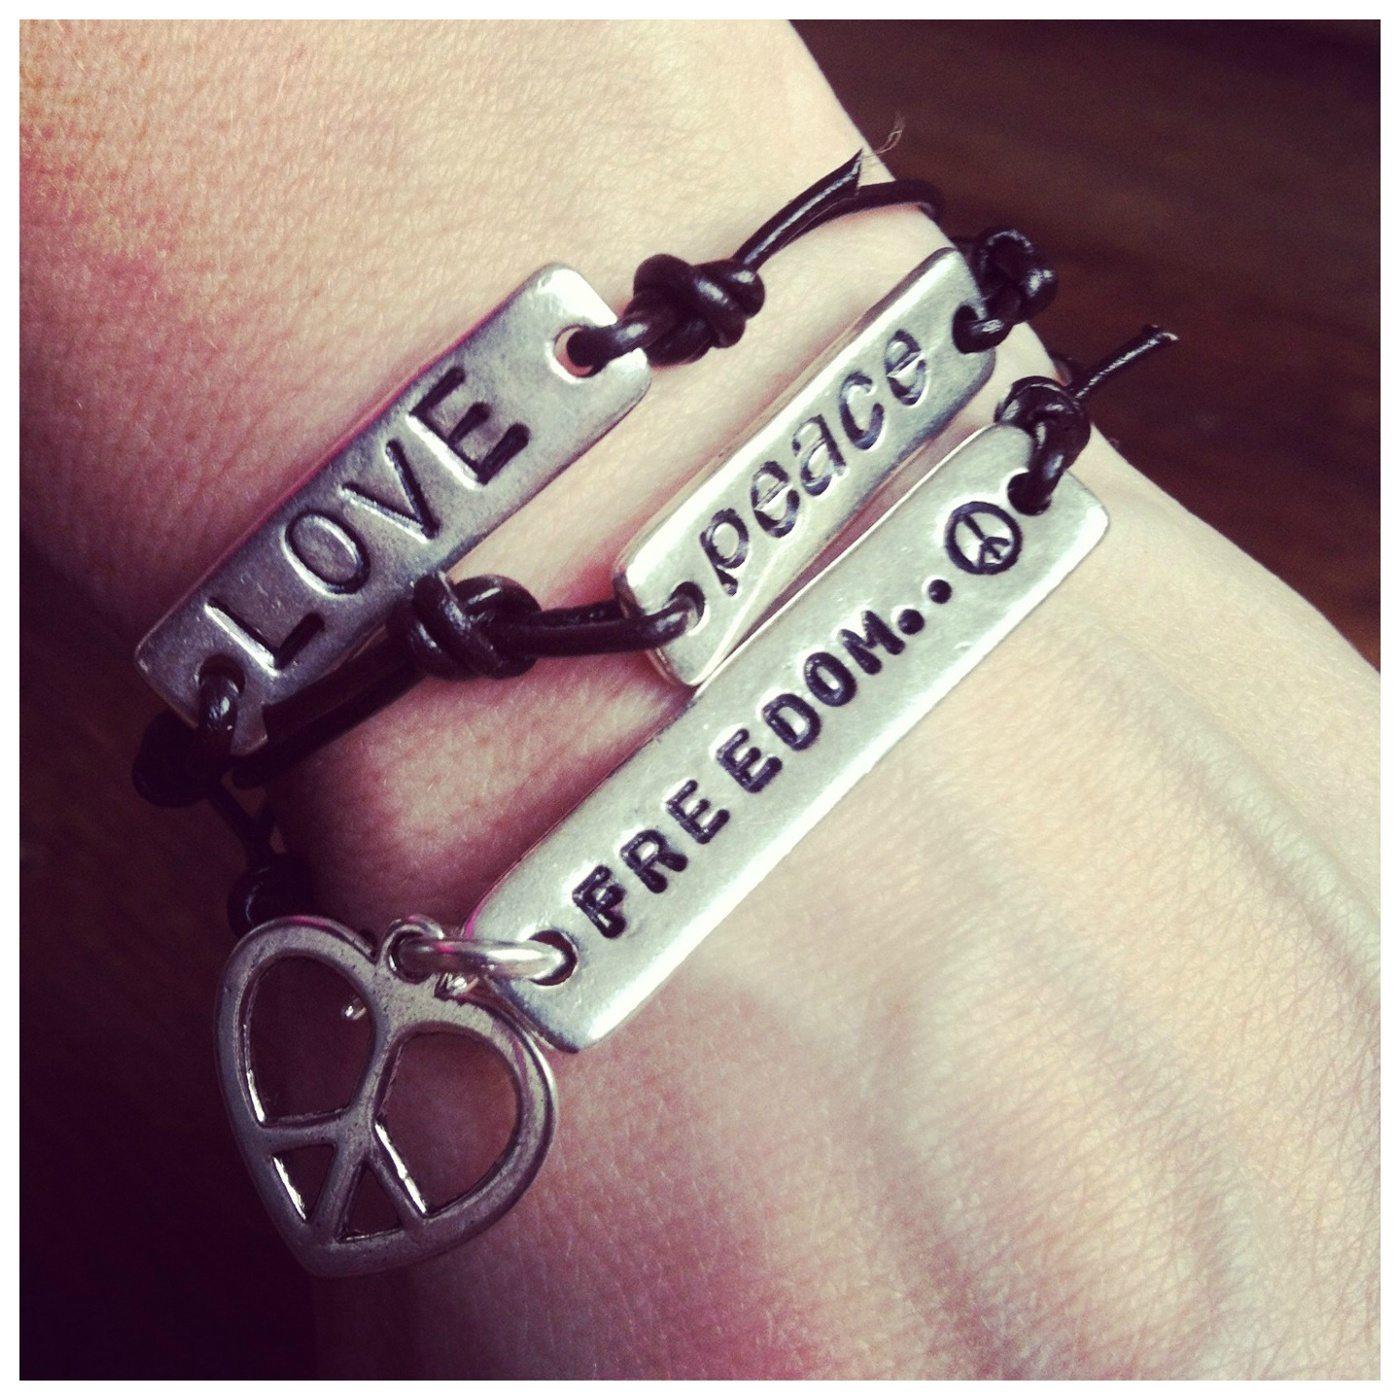 LOVE PEACE FREEDOM